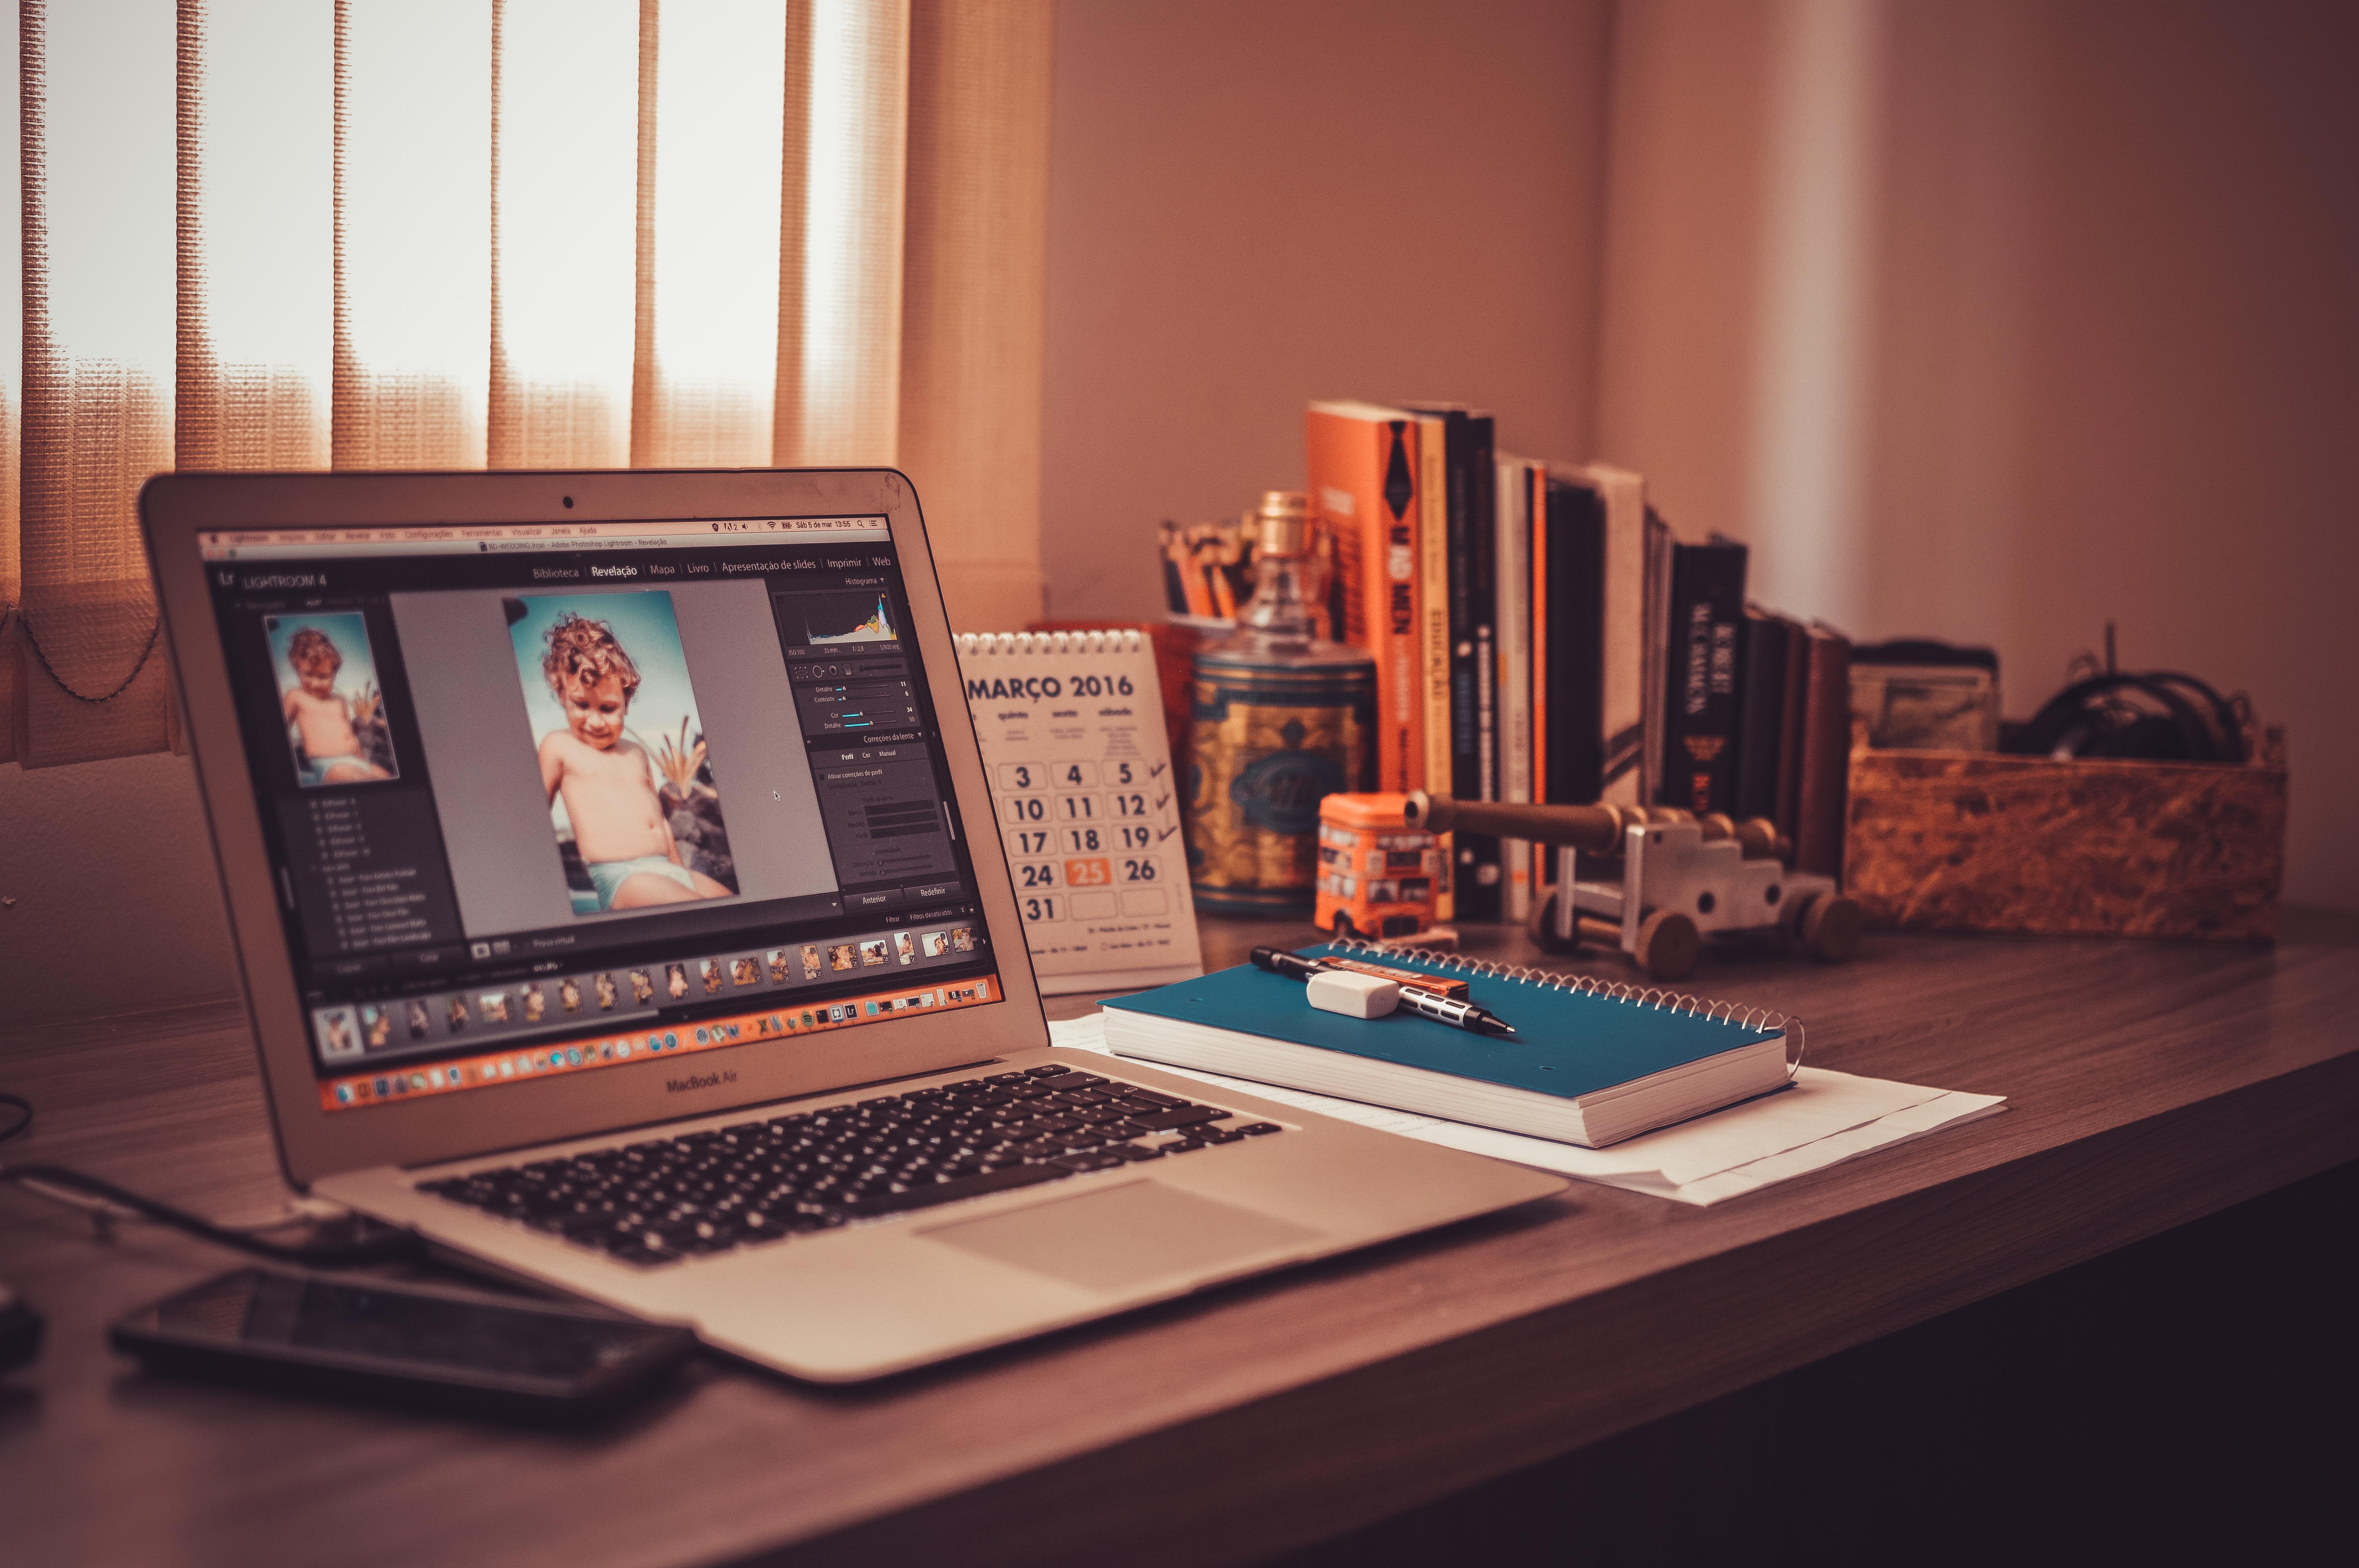 photoshop printing faqs